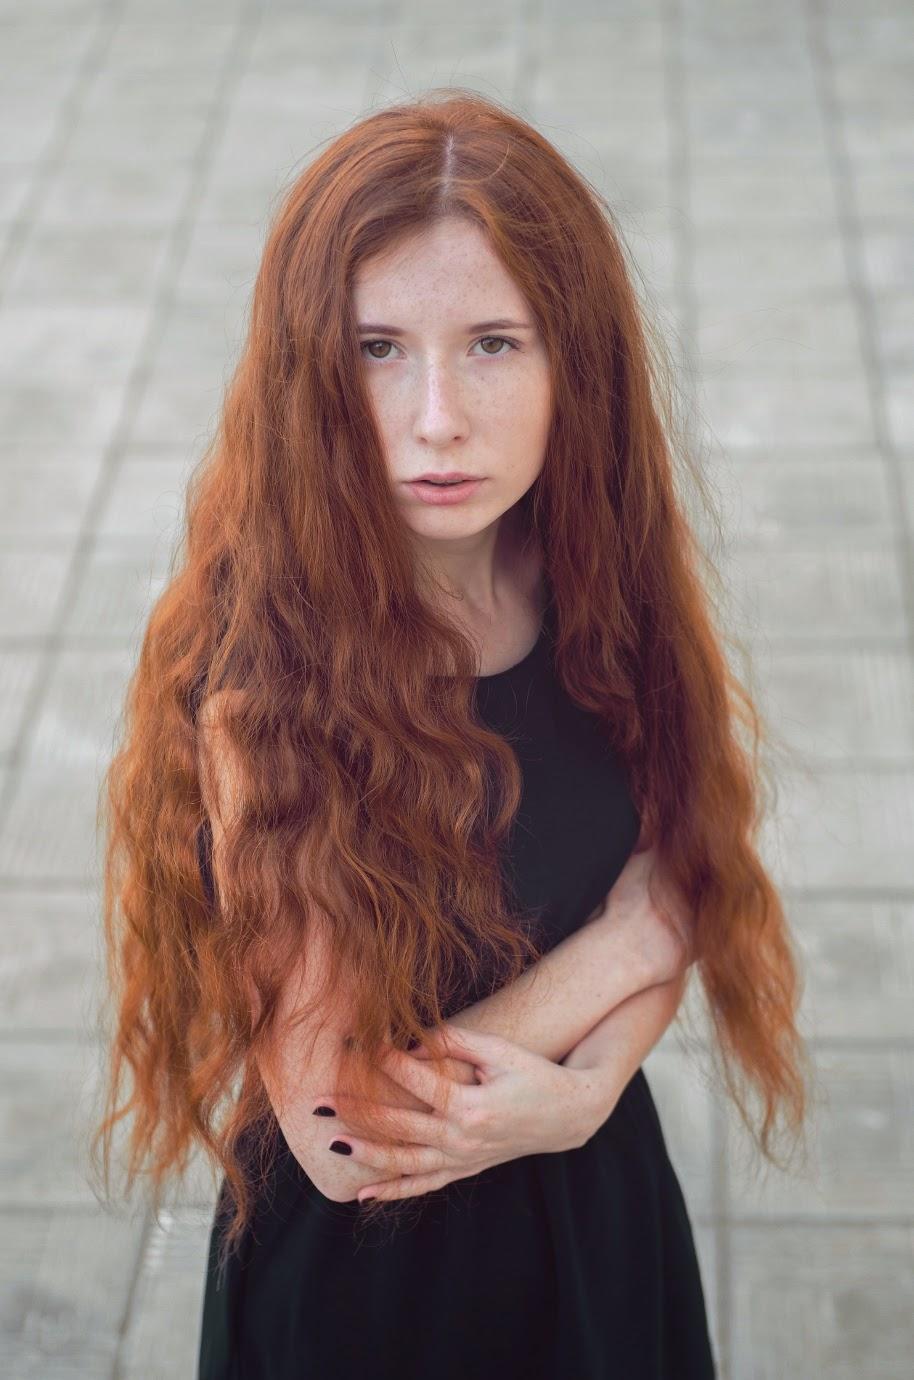 Даша. Портрет